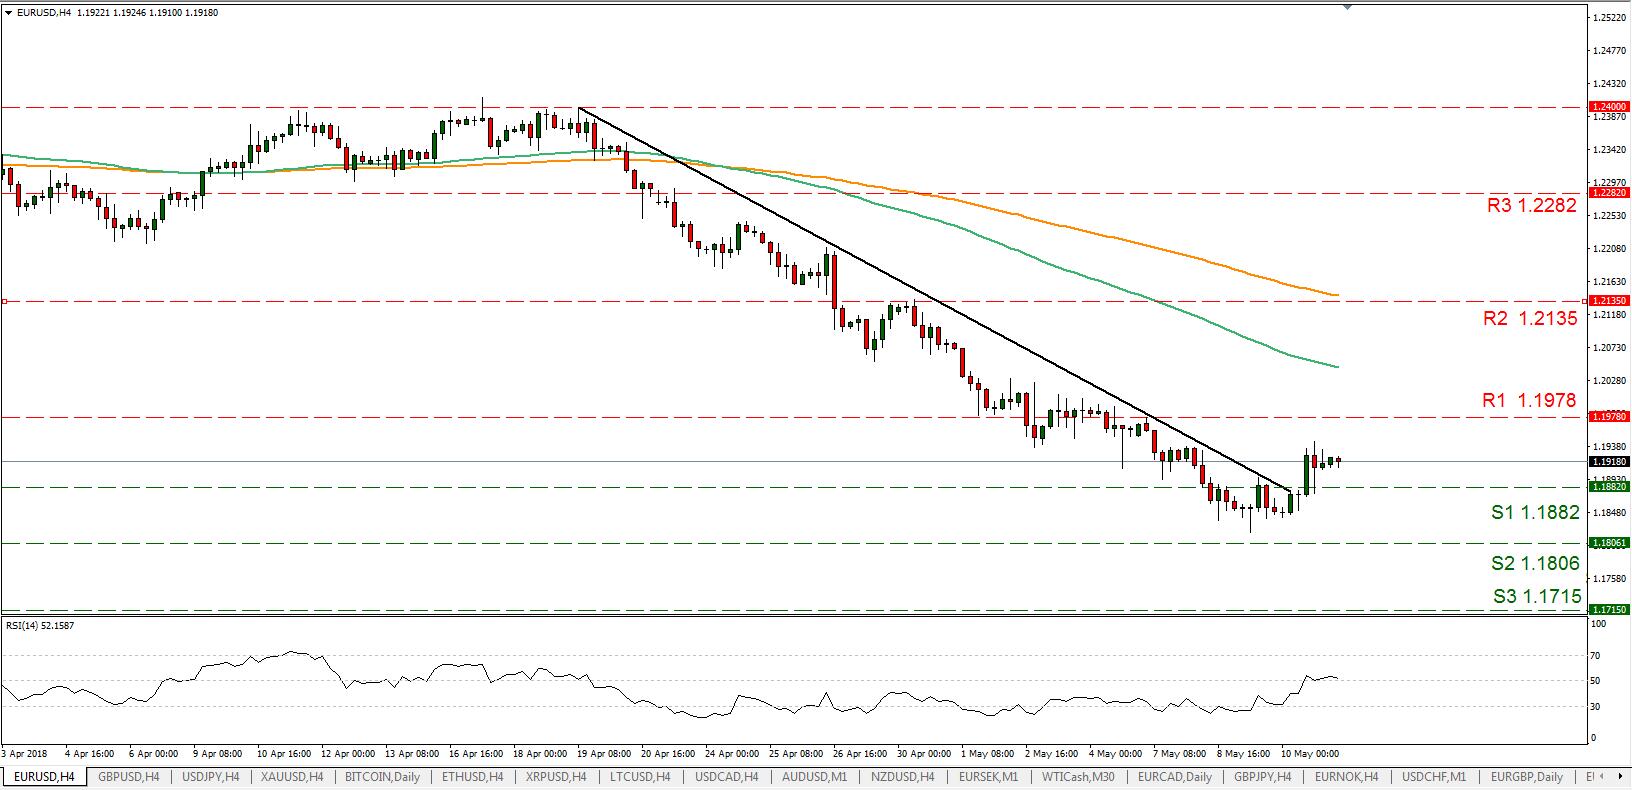 EUR/USD 11/05/2018 | EconAlerts